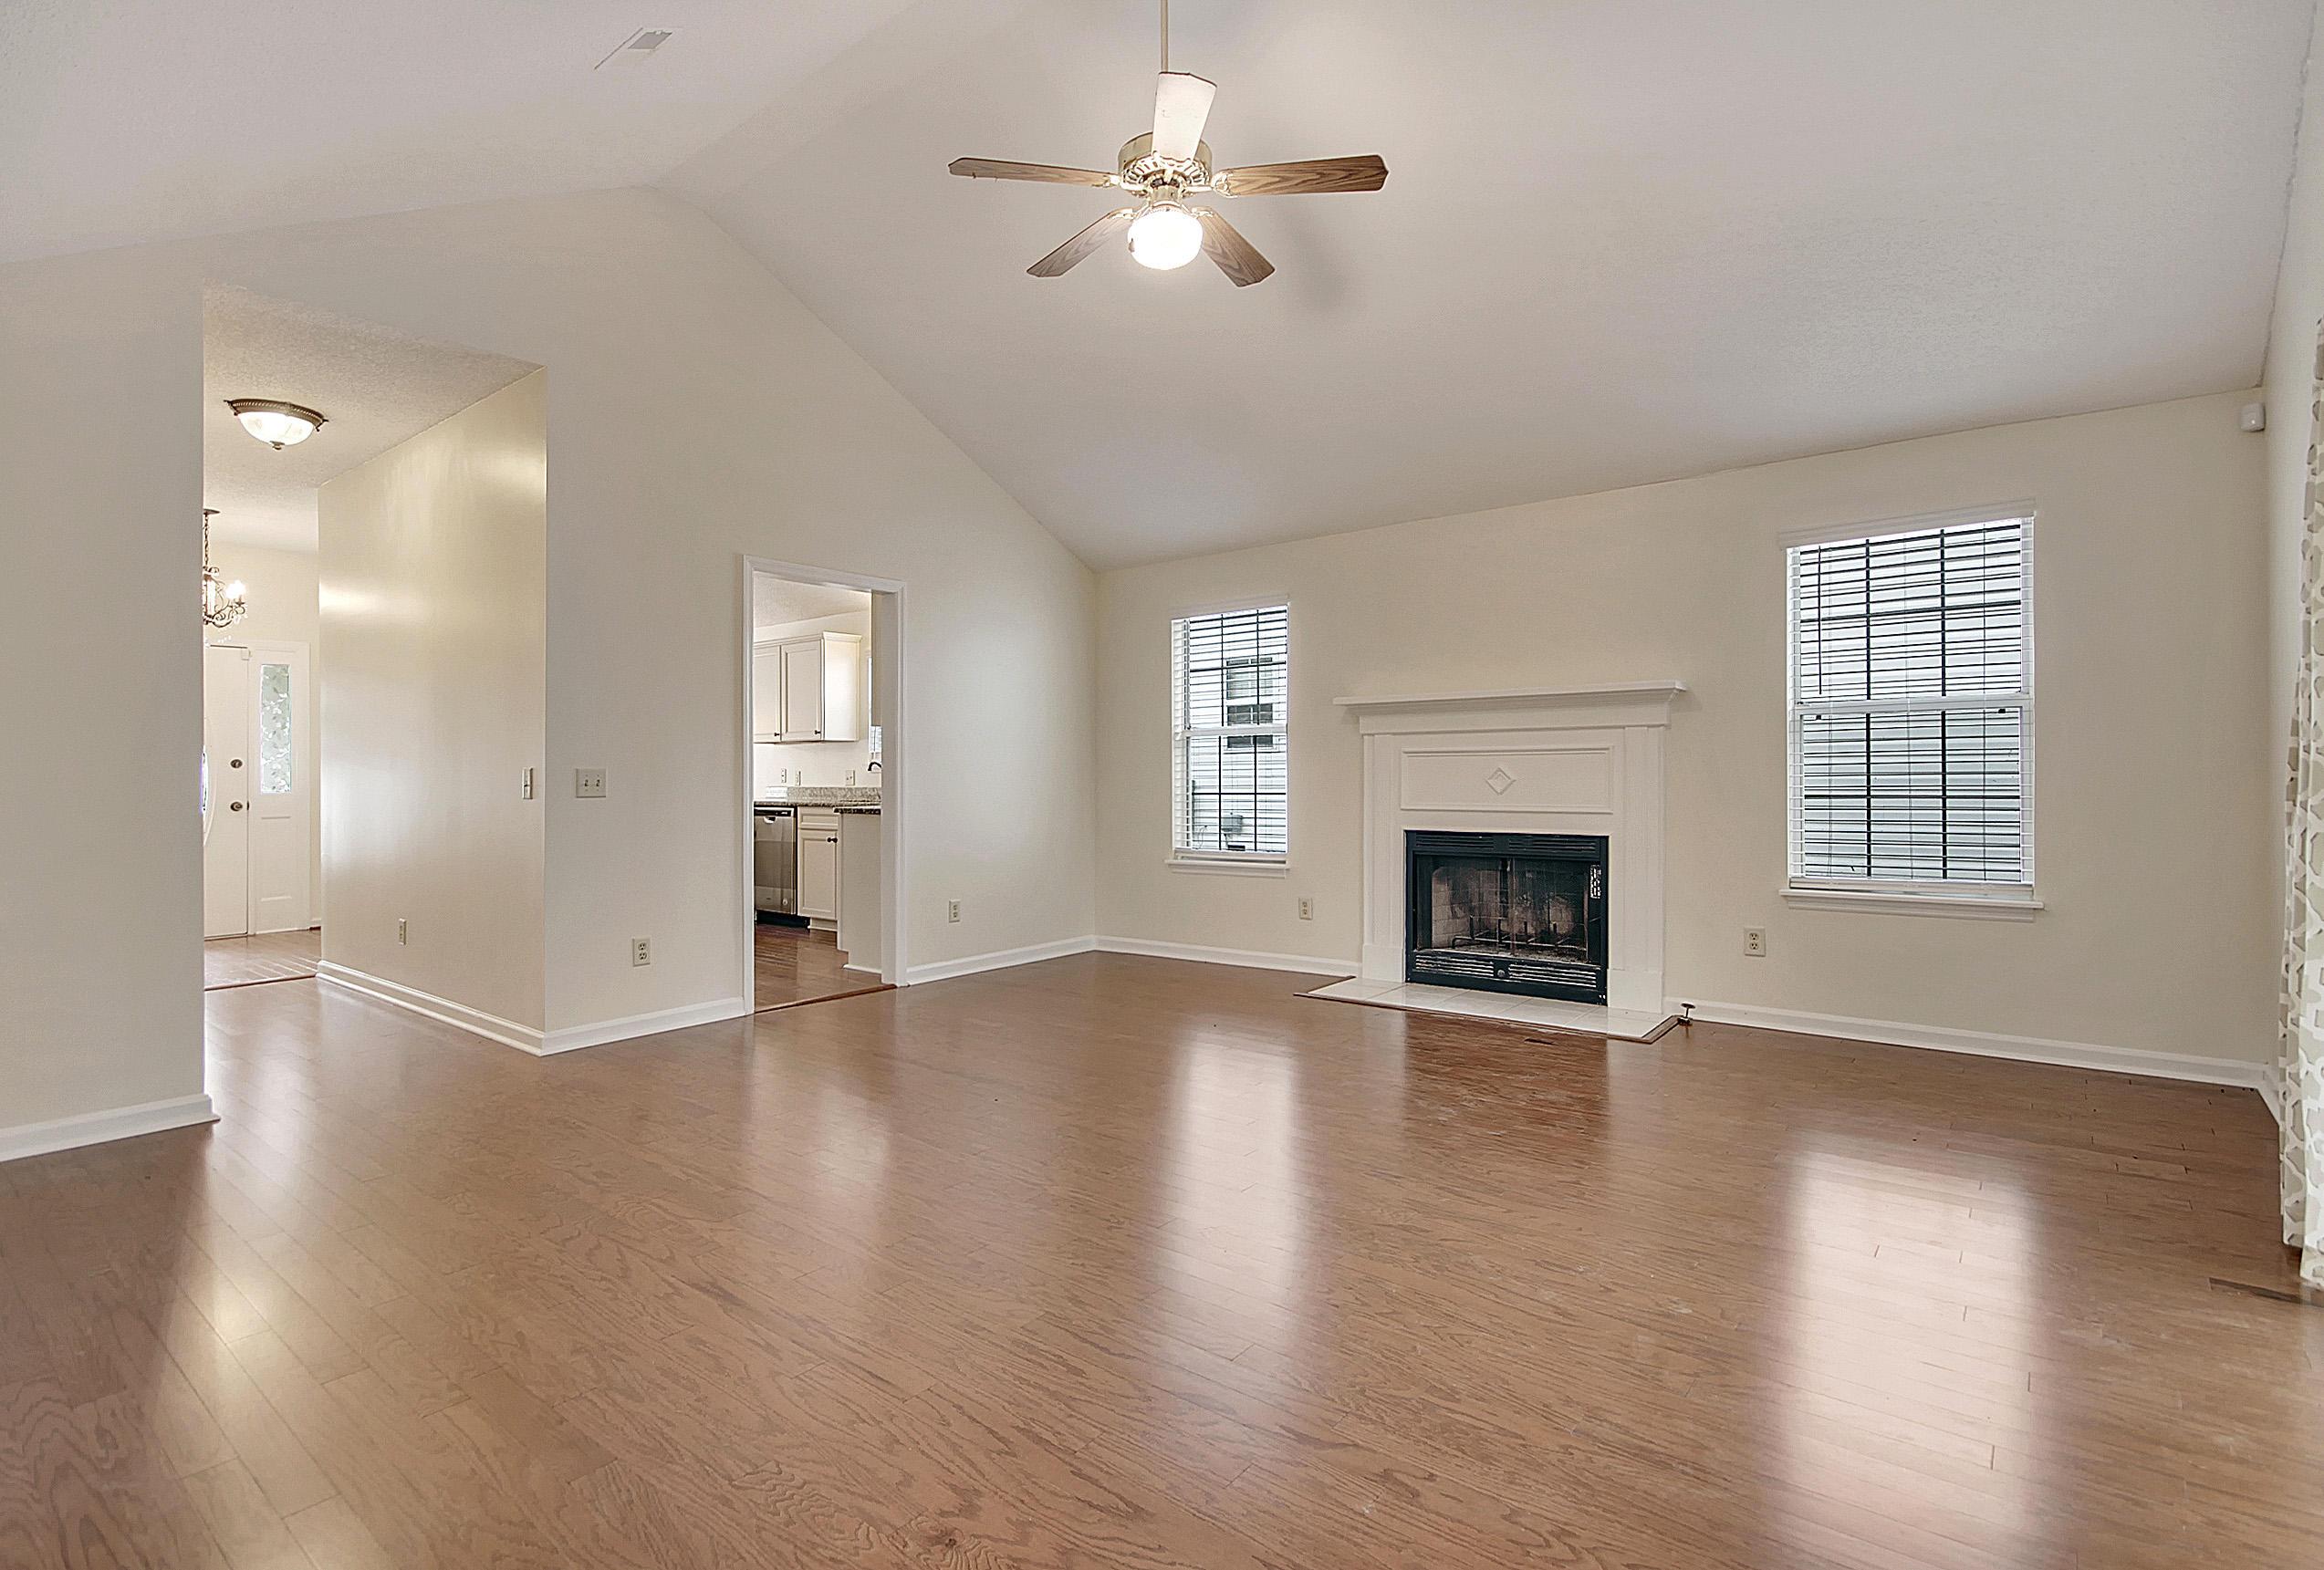 Harbor Place Homes For Sale - 845 Harbor Pl, Charleston, SC - 7